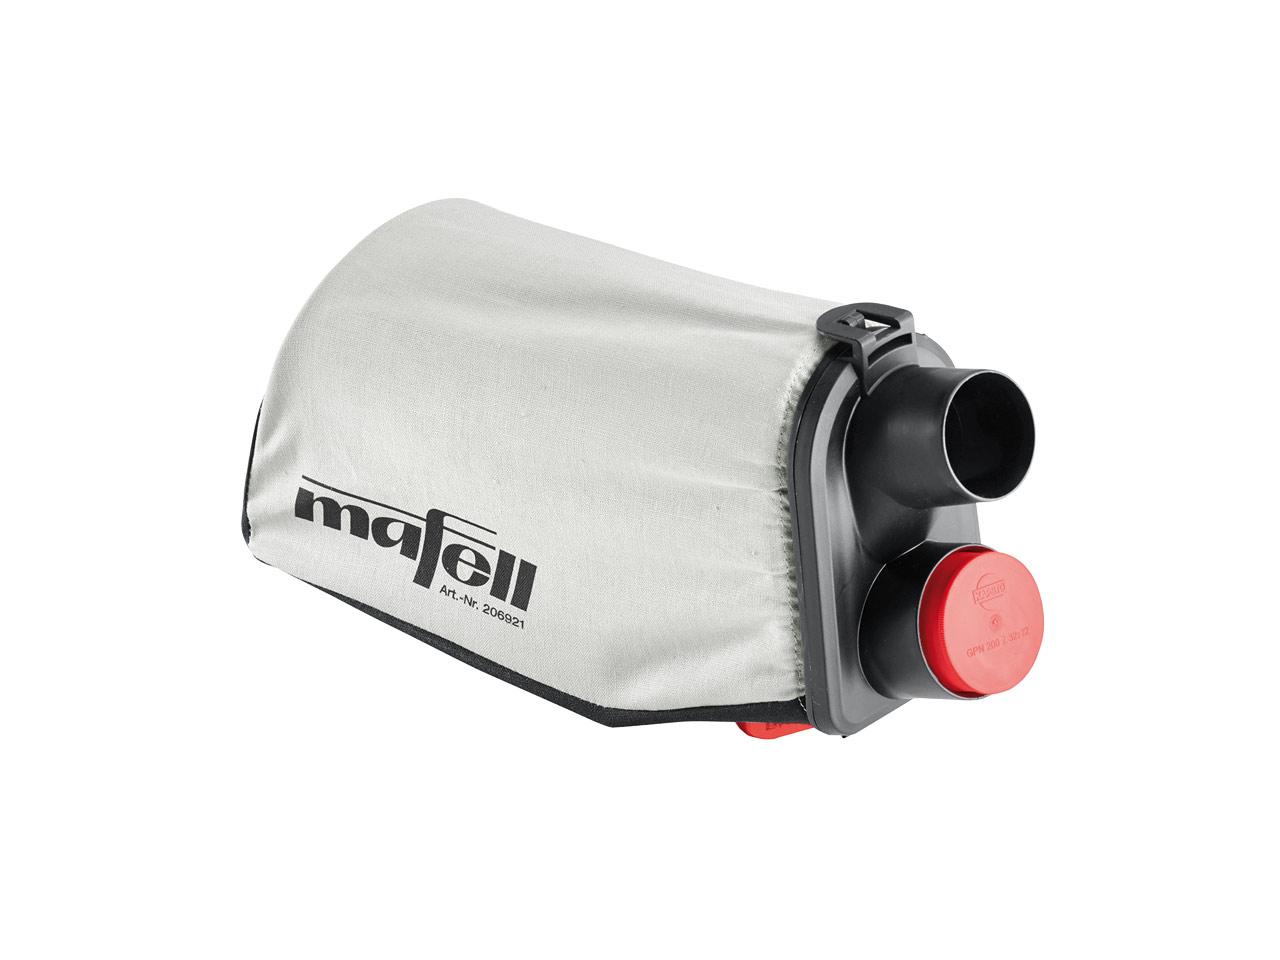 Mafell_206921.jpg